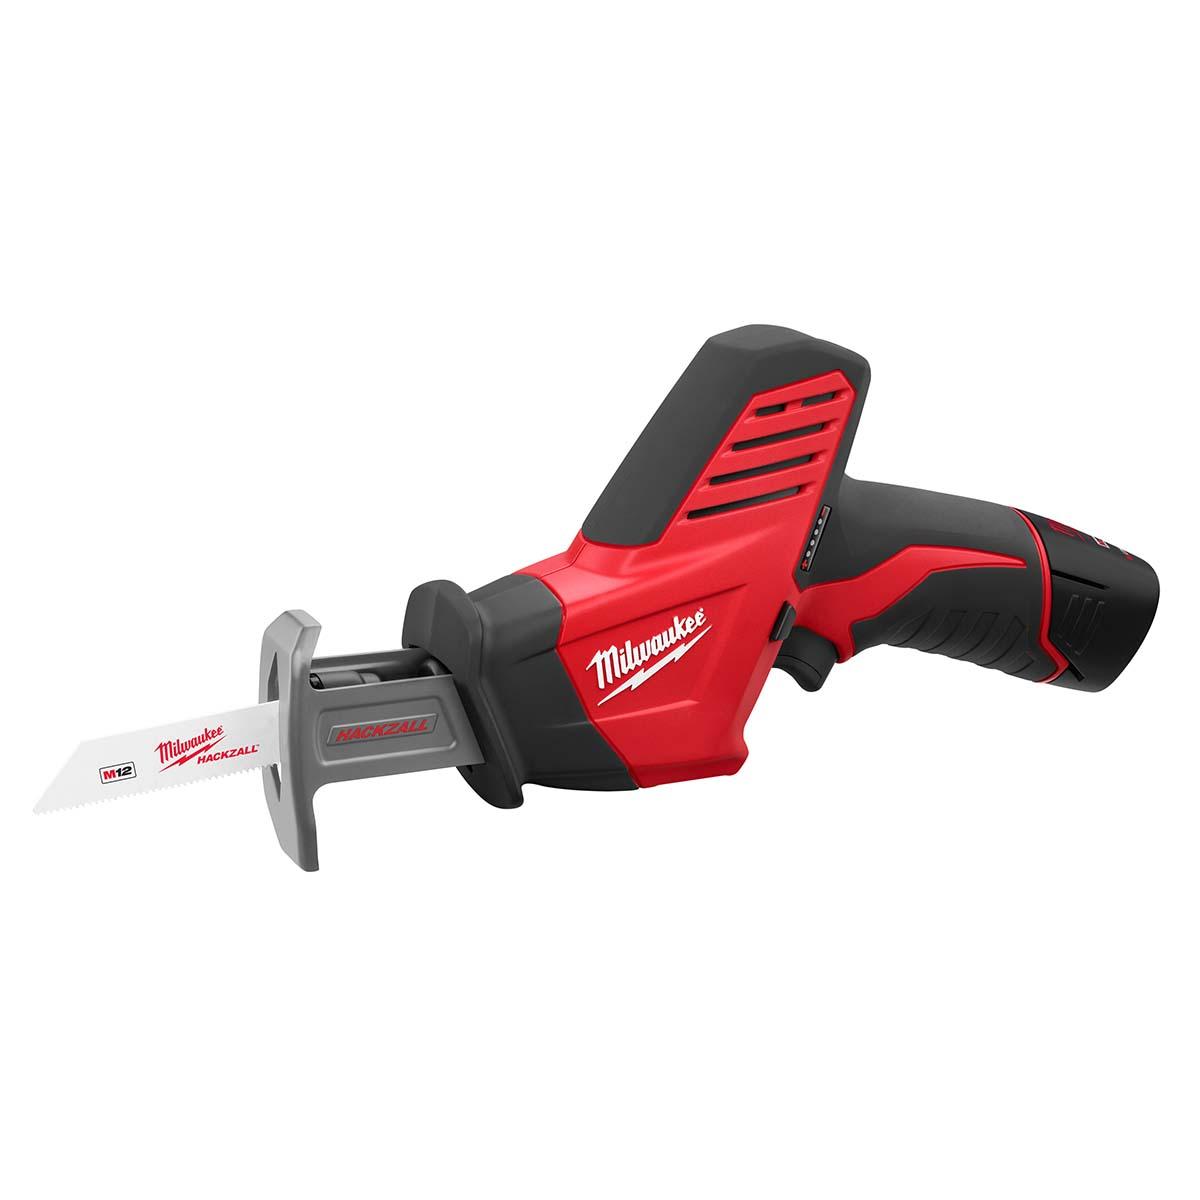 M12™ HACKZALL® Recip Saw Kit